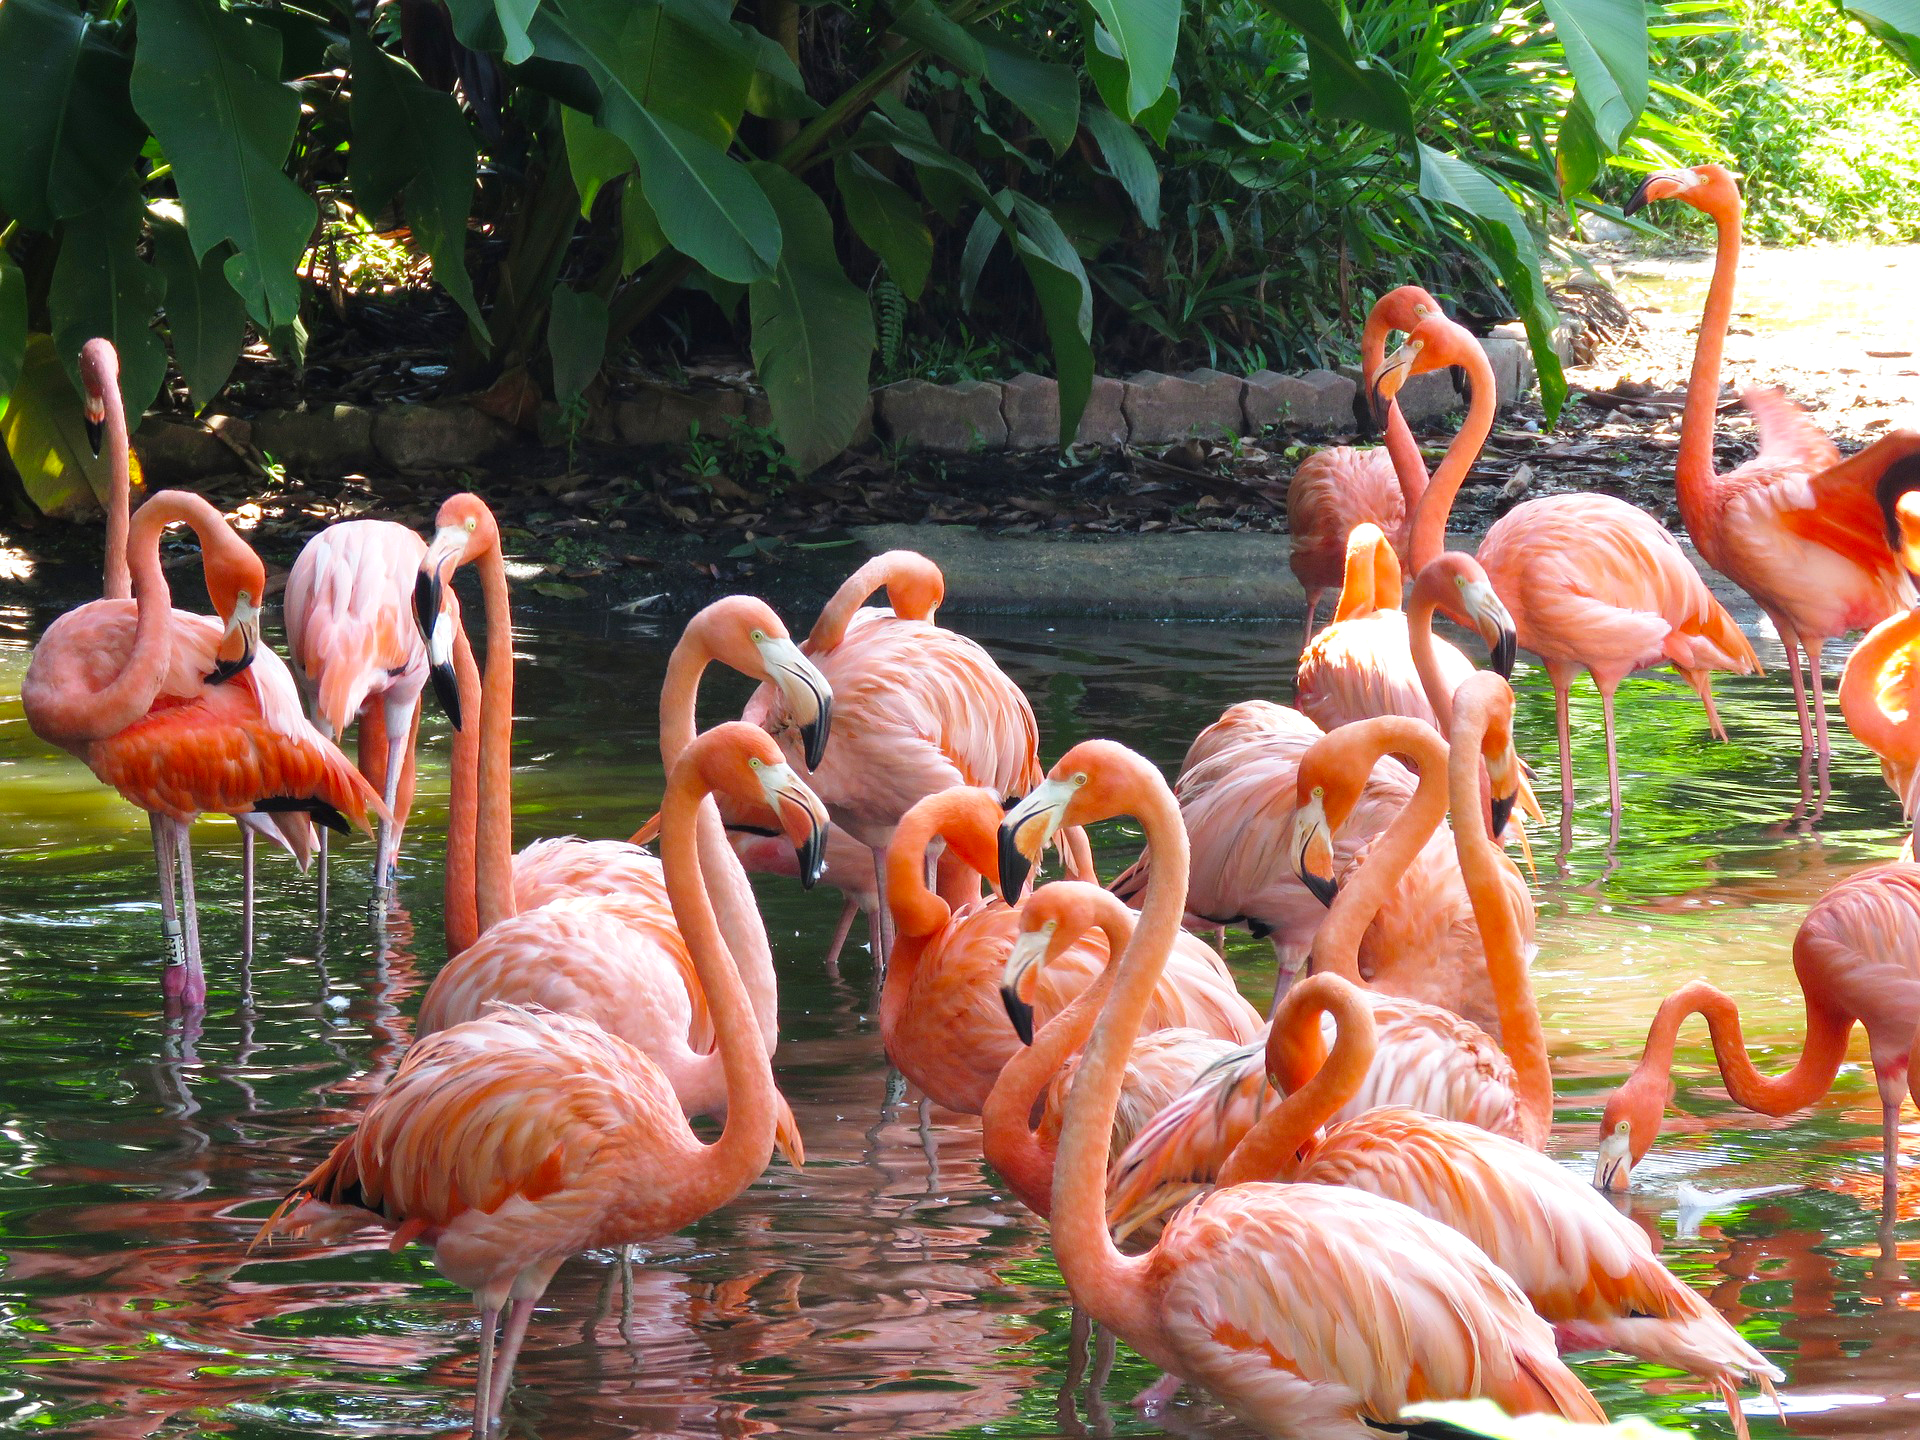 flamingo - pixabay